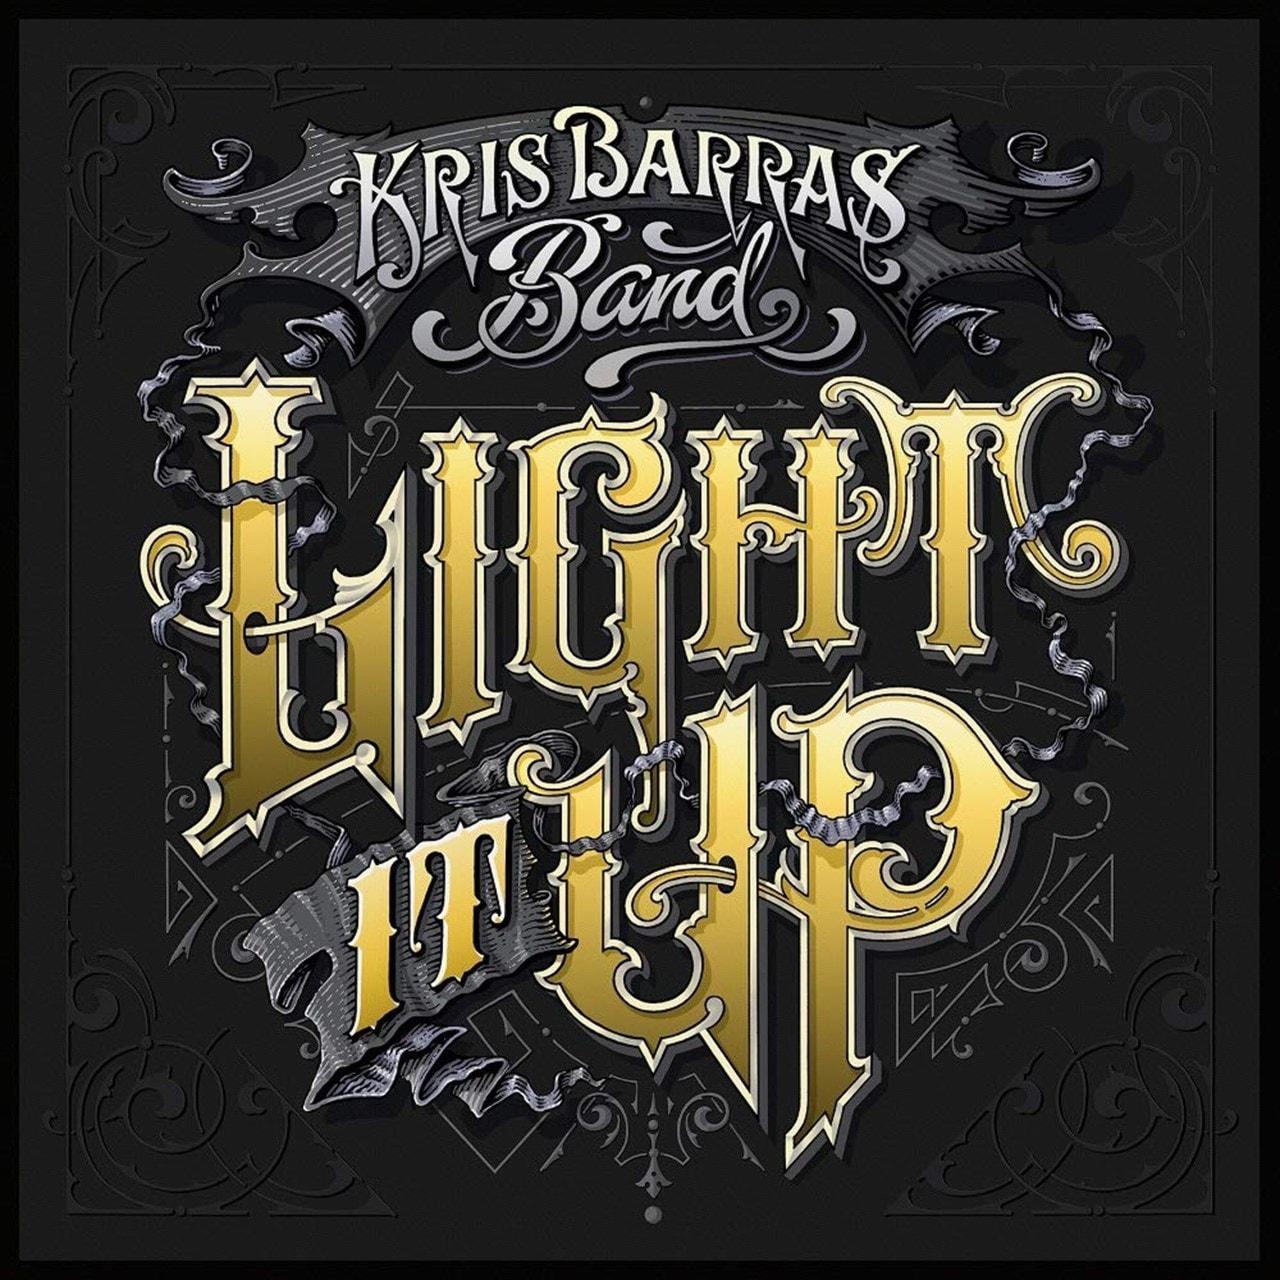 Light It Up - 1